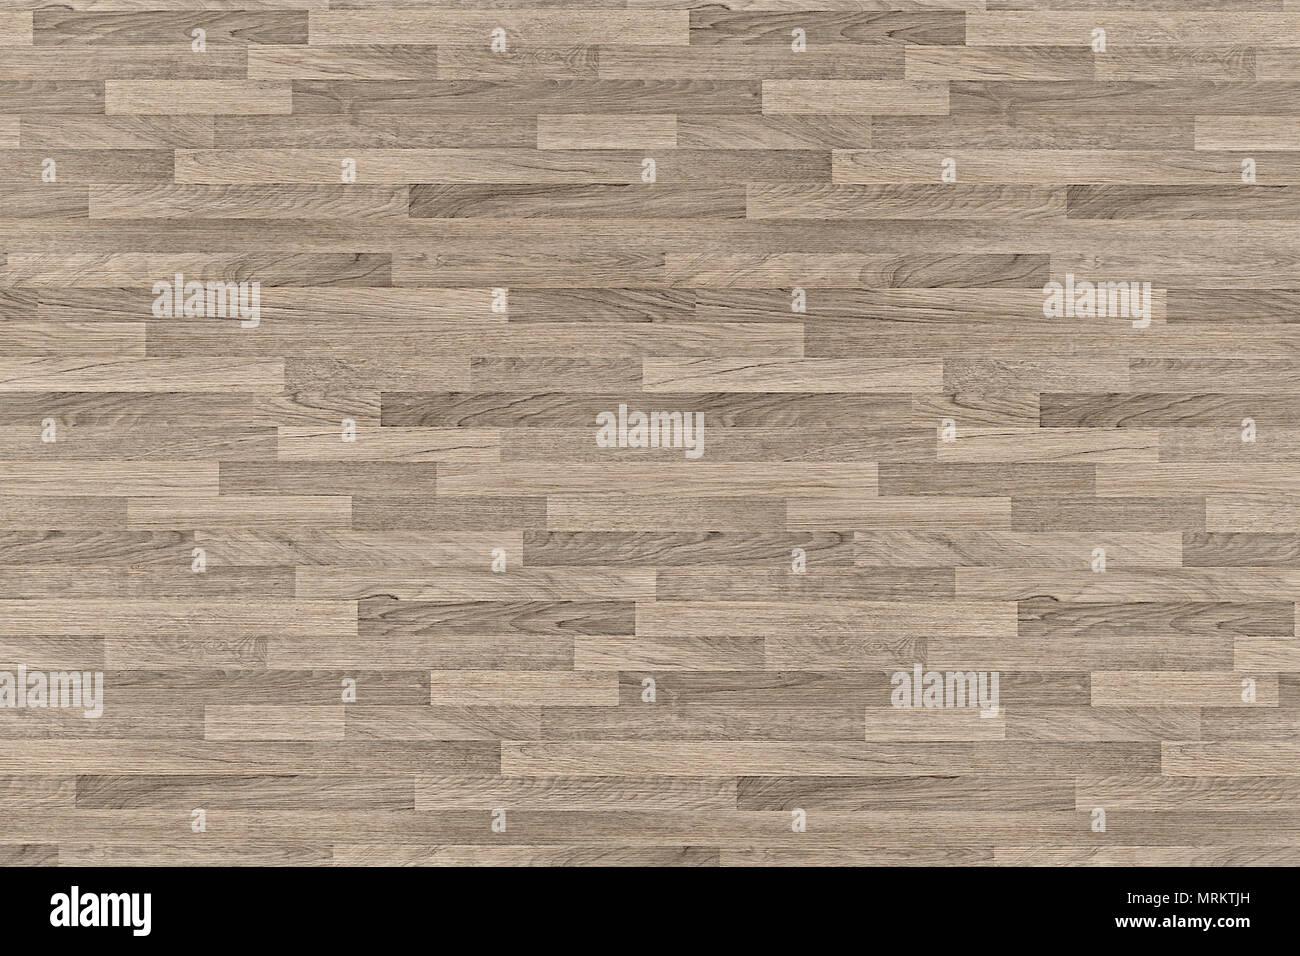 Laminat Parkett Aus Hellem Holz Textur Hintergrund Stockfoto Bild